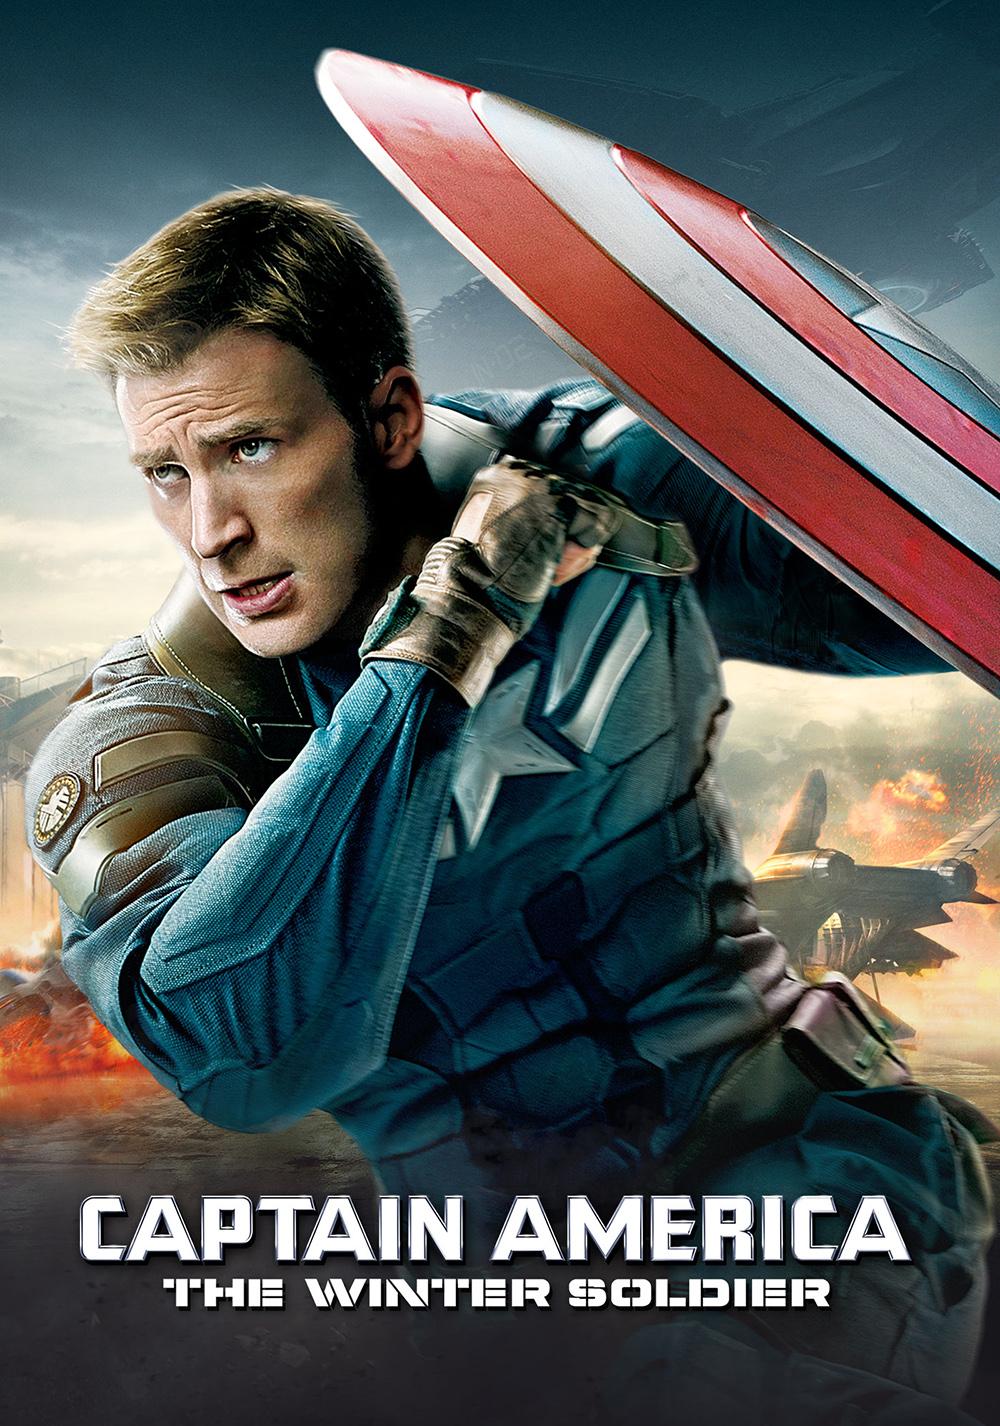 Captain America Movie Captain America Movie Captain America Movie